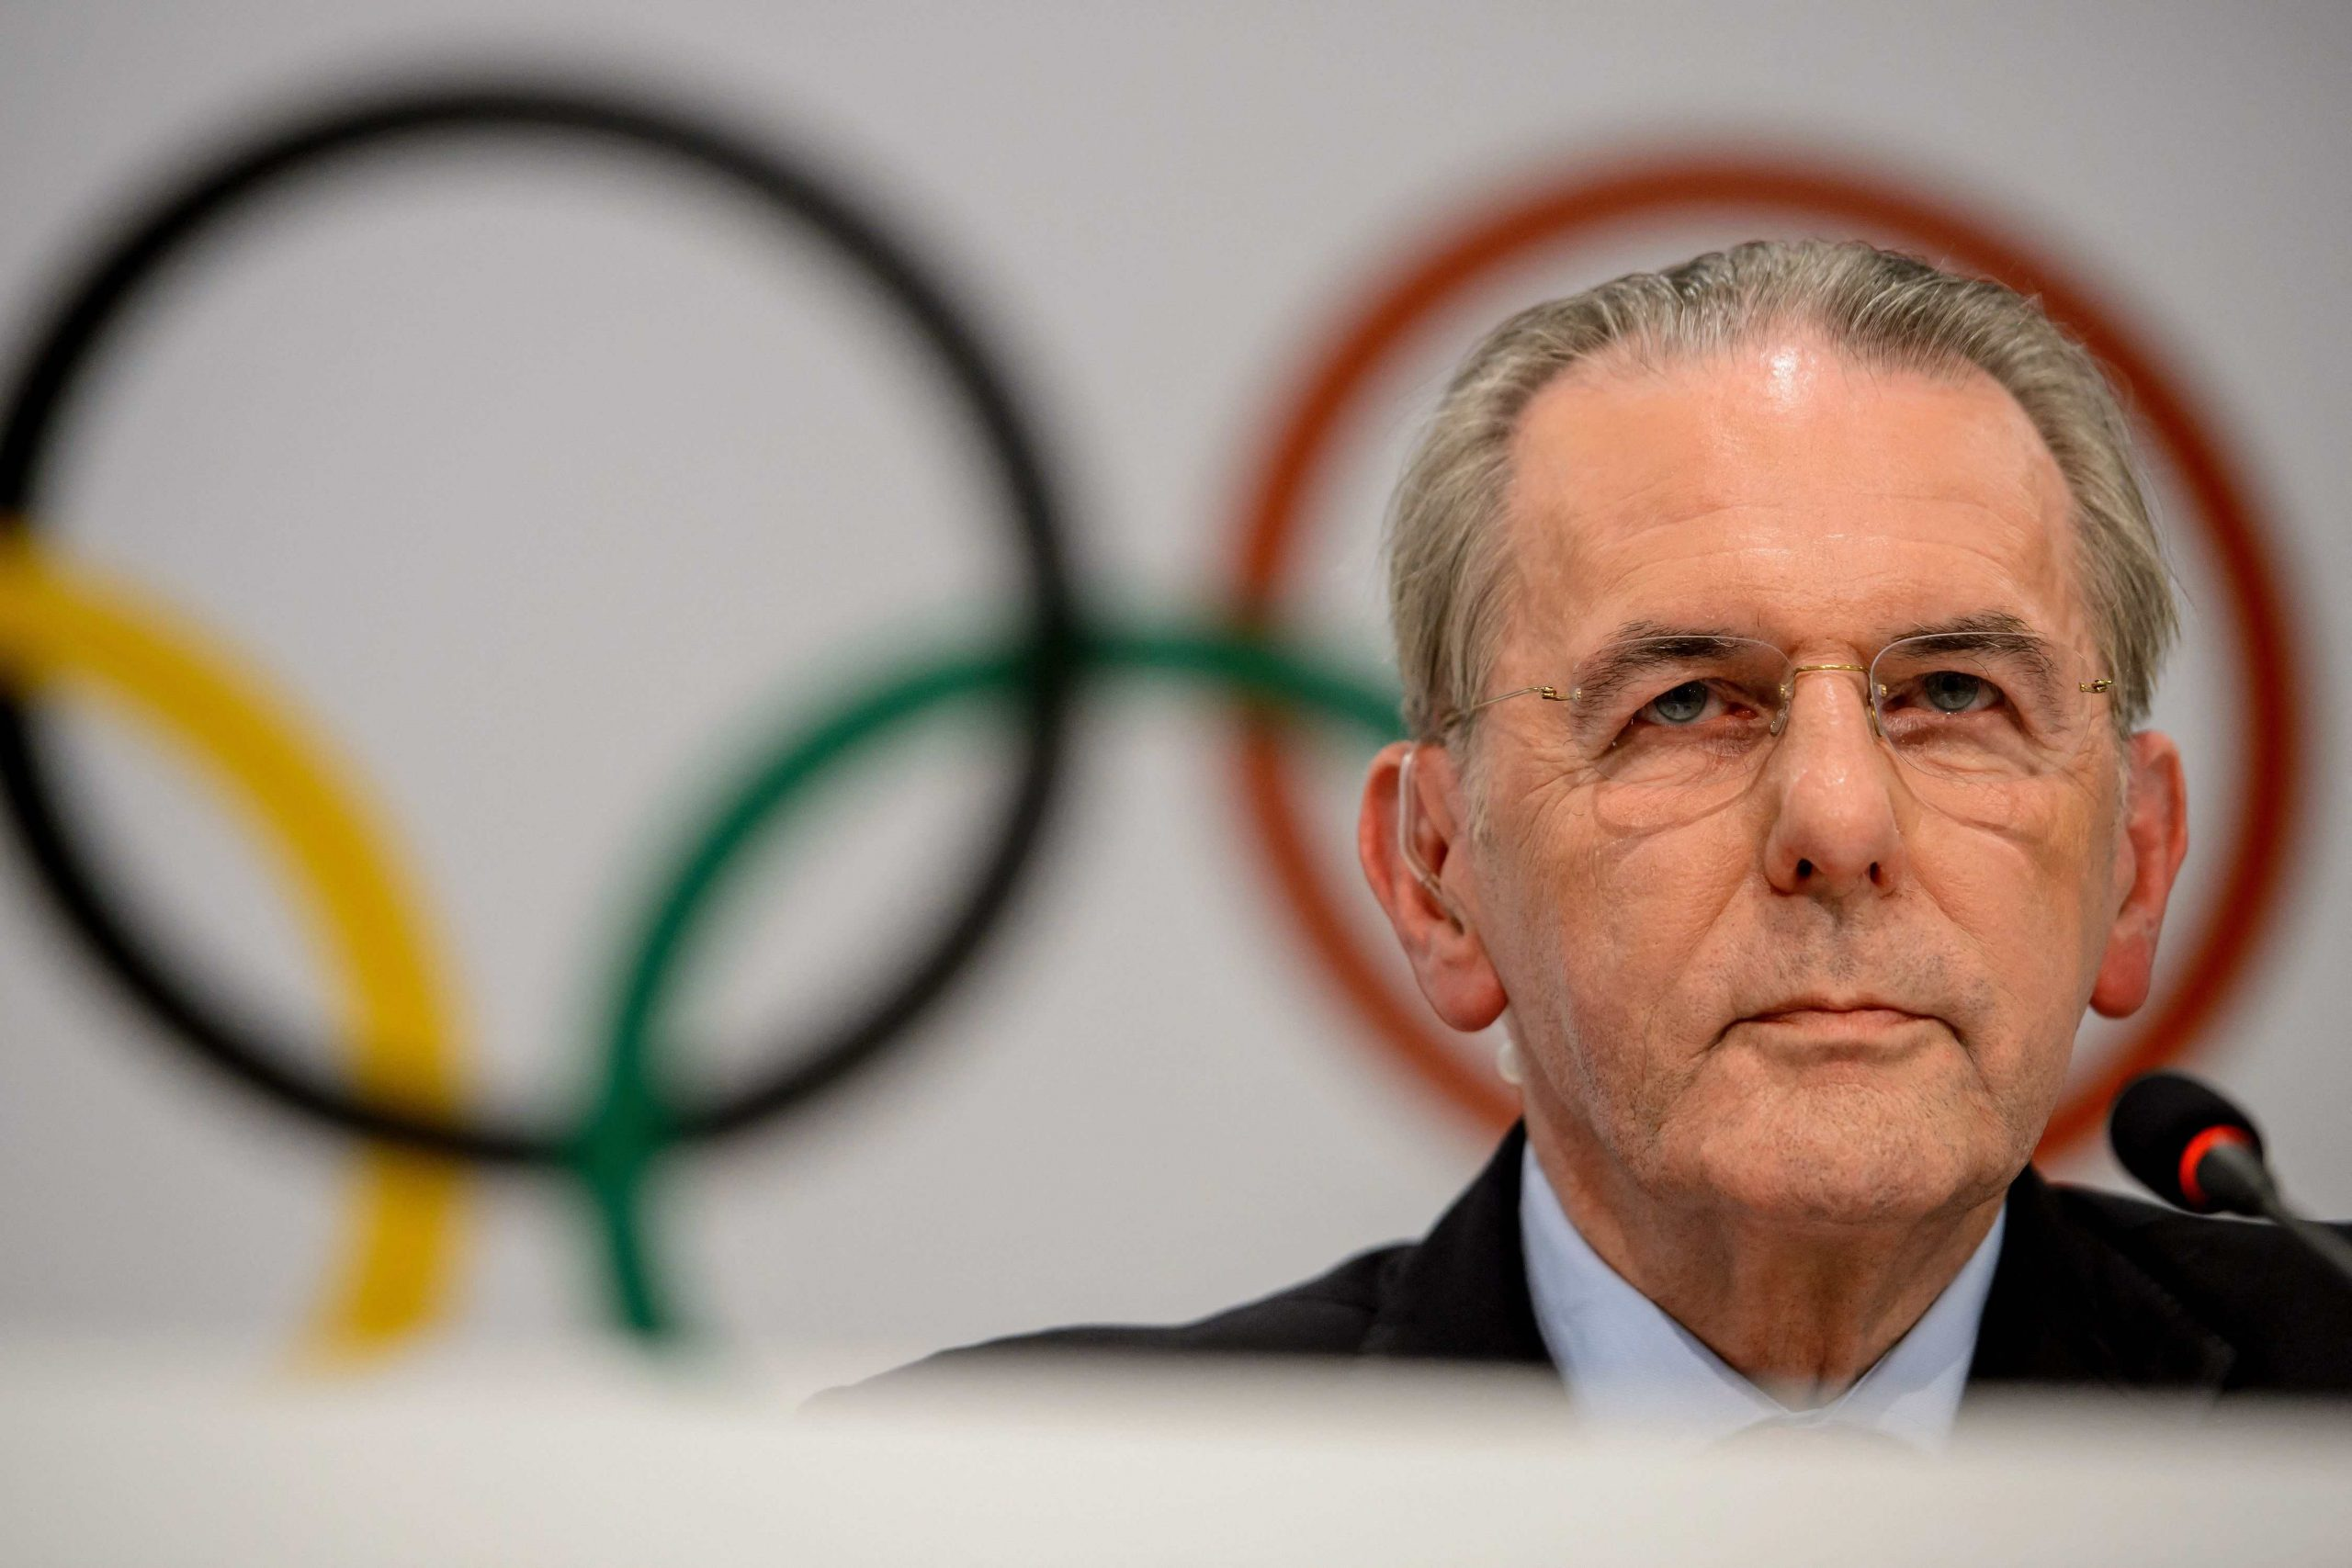 Jacques Rogge, expresidente del COI, muere a los 79 años - Prensa Libre